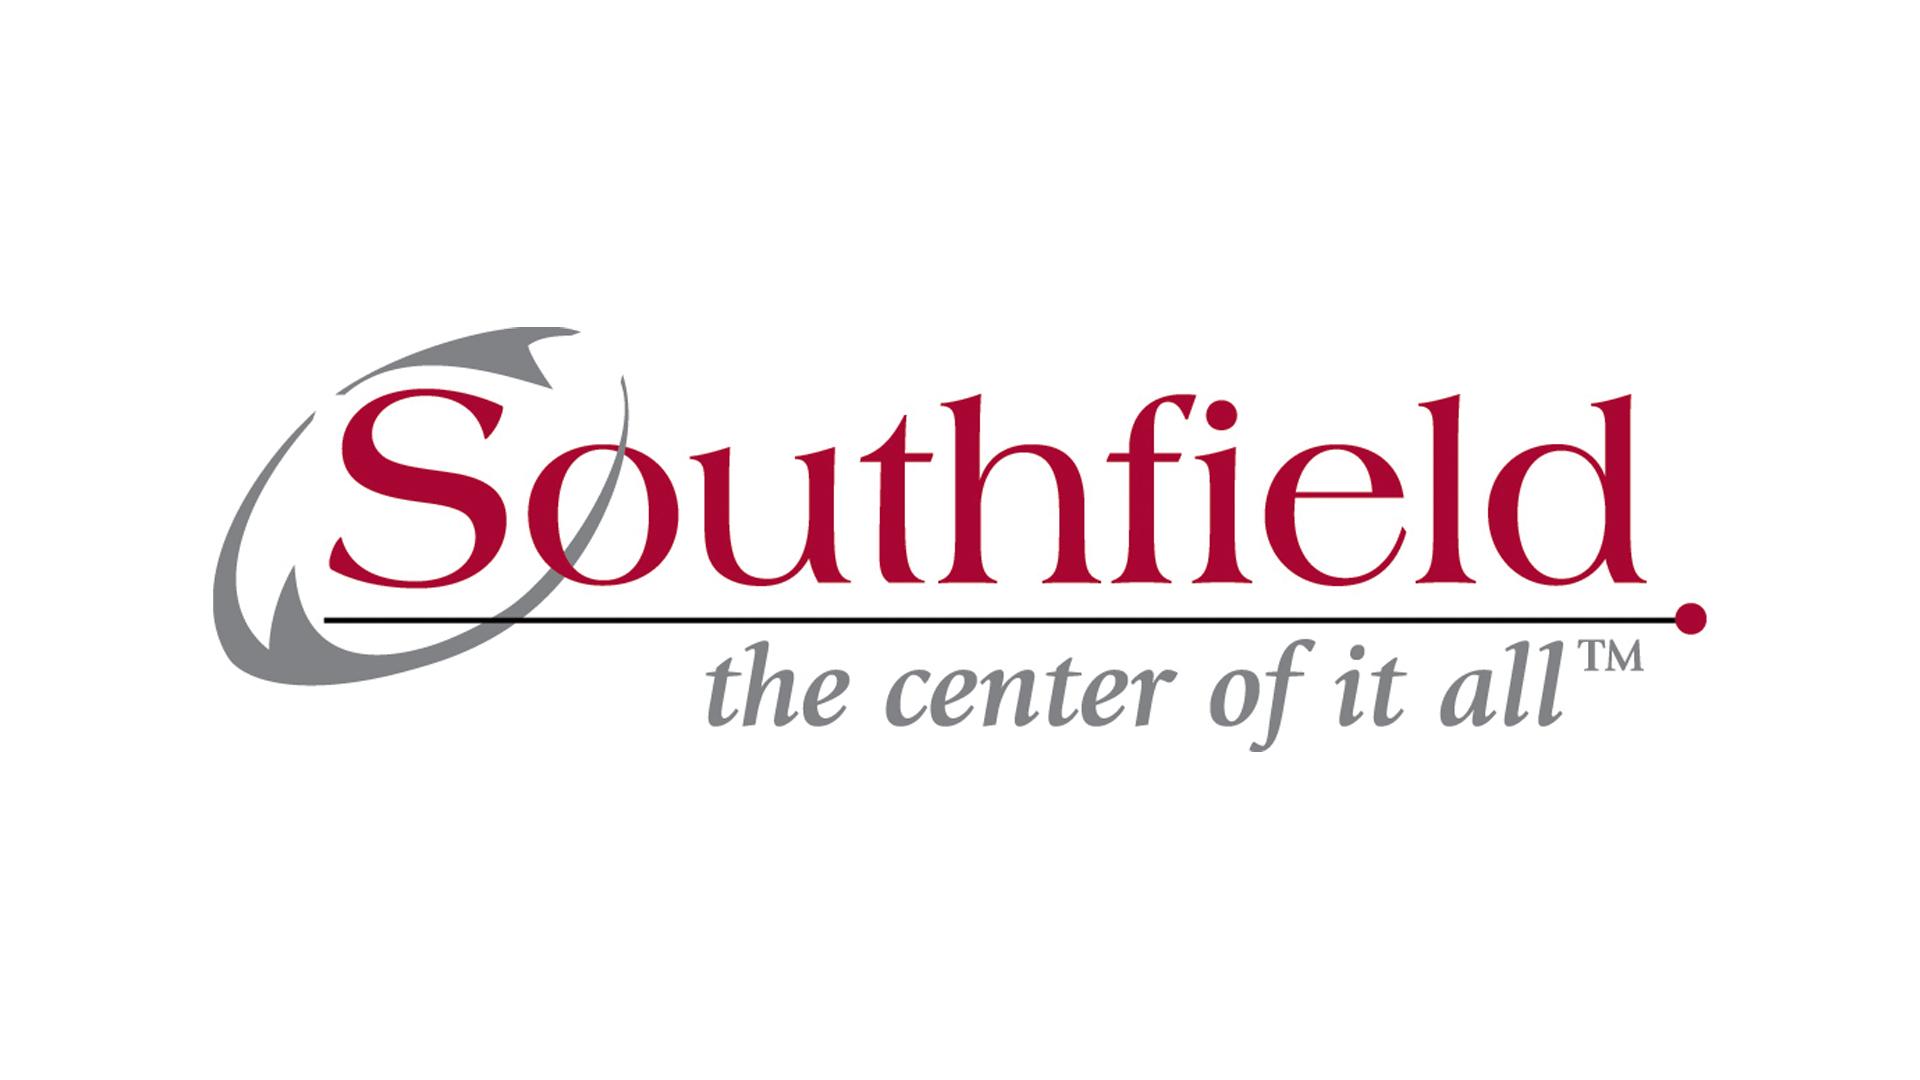 City of Southfield